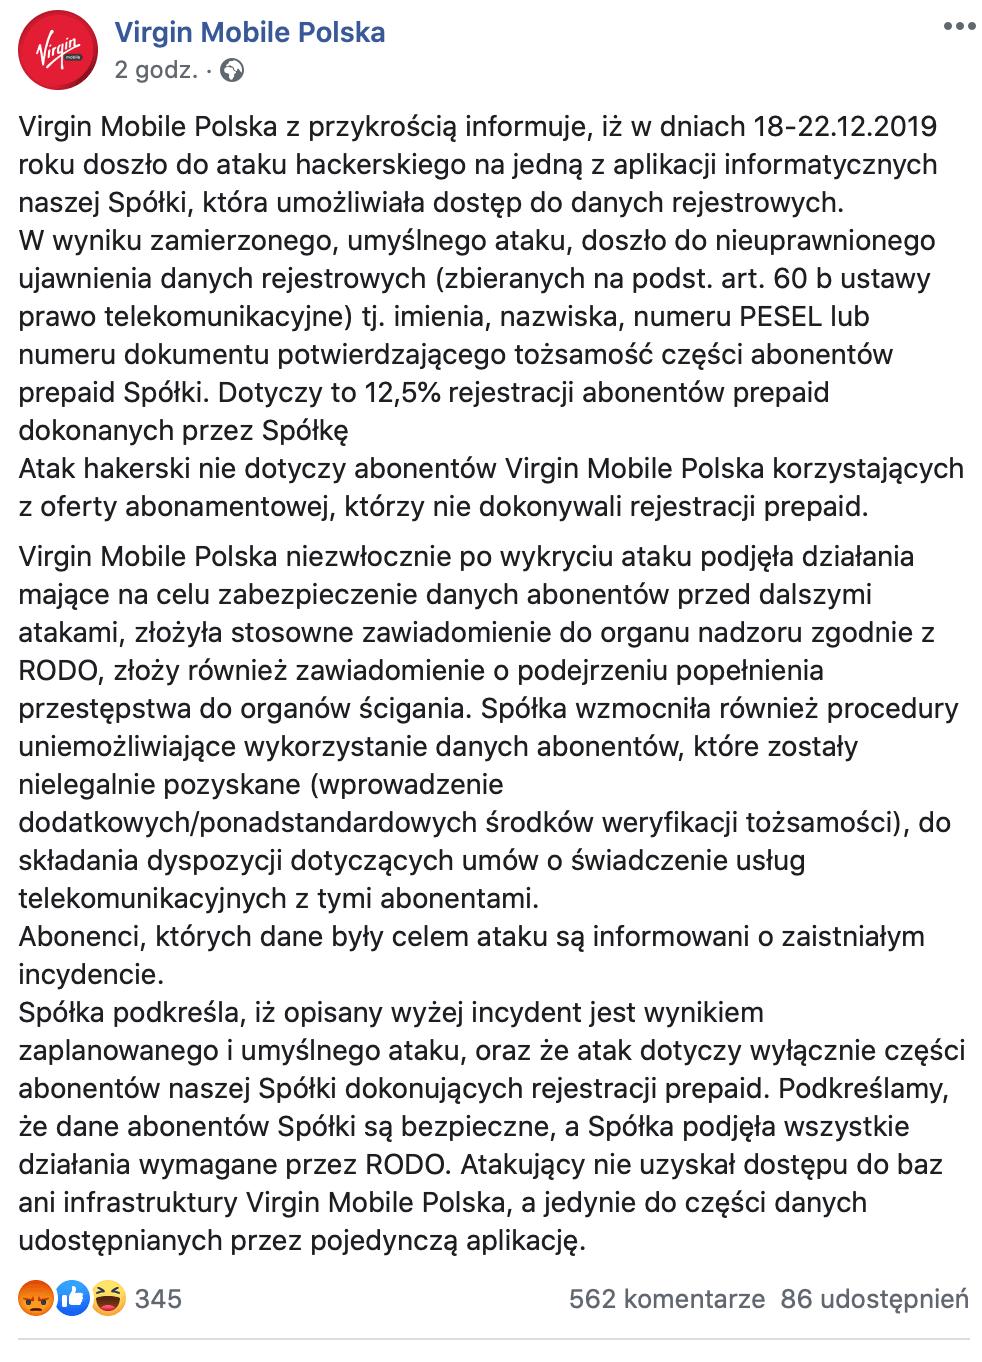 Komunikat Virgin Mobile Polska o wycieku danych (25.12.2019 r.)